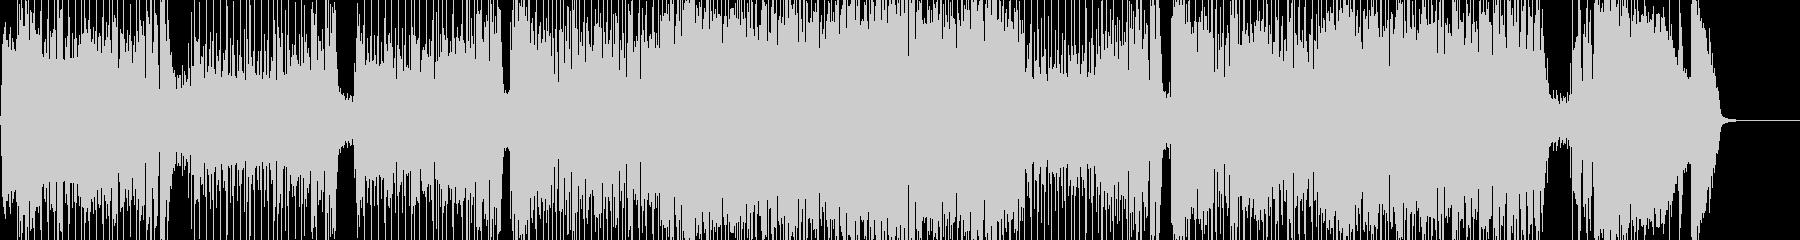 ❶Gt生演奏♫最高ロカビリー・スウィングの未再生の波形